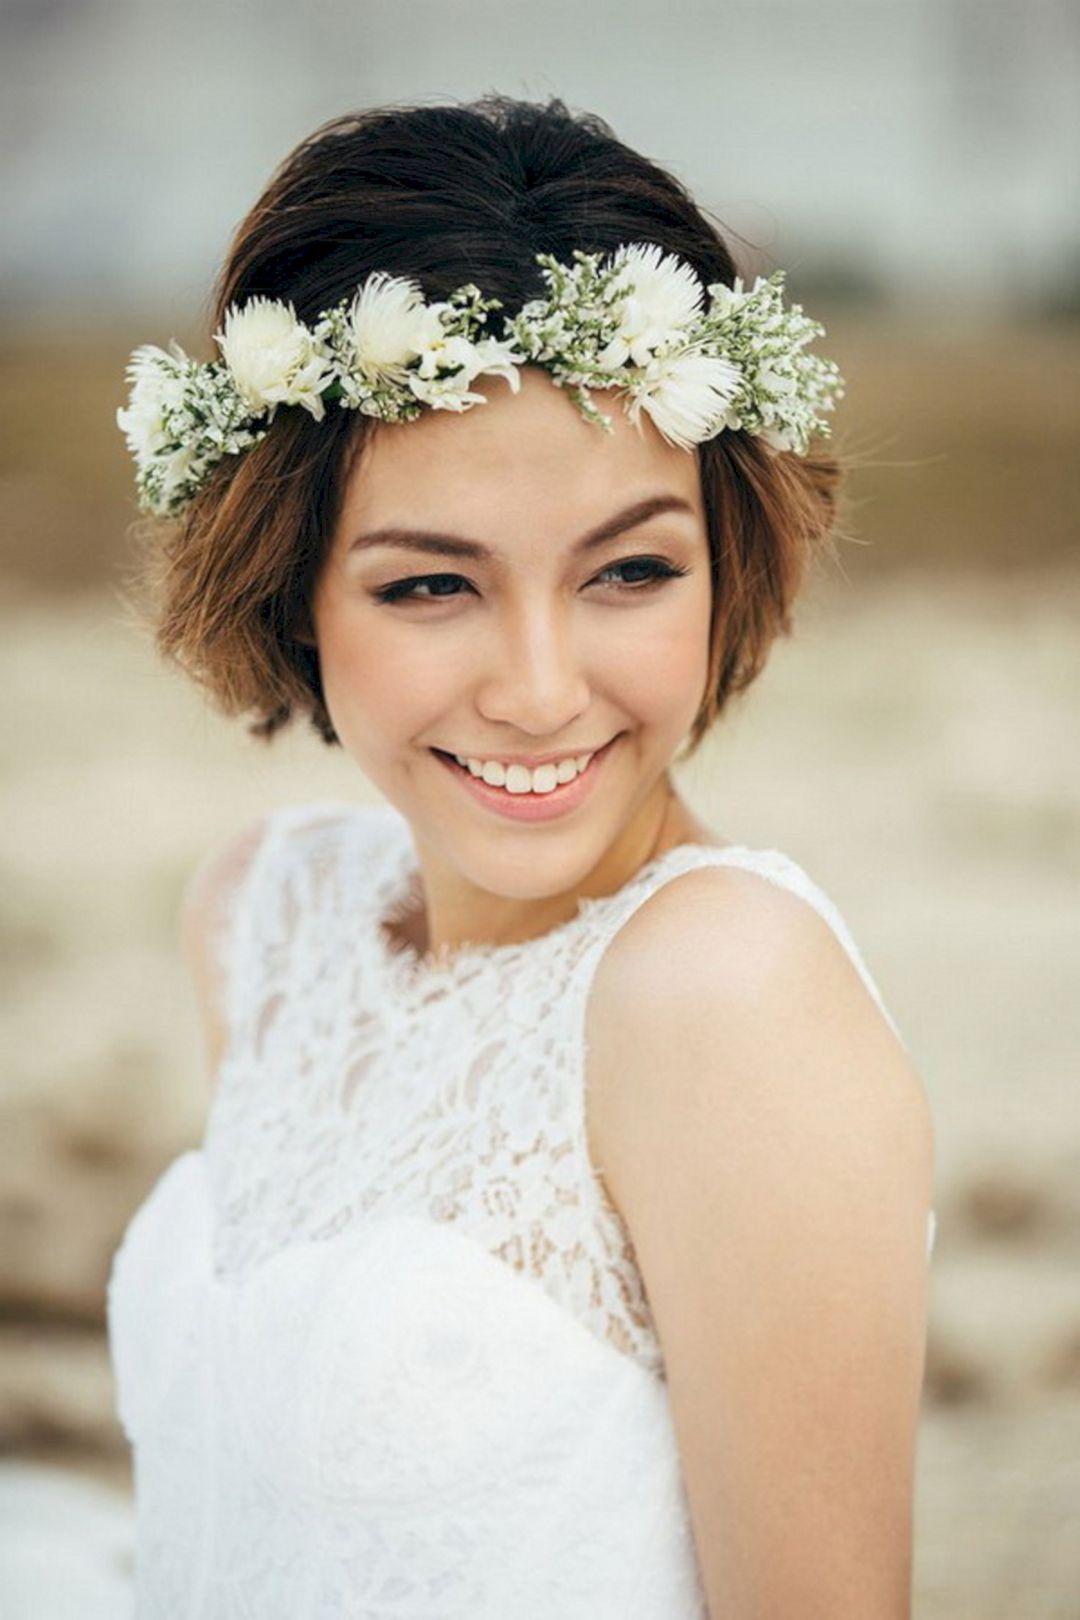 20 Best And Wonderful Wedding Short Hairstyles Design Ideas Short Hair Bride Short Wedding Hair Flower Crown Hairstyle [ 1620 x 1080 Pixel ]